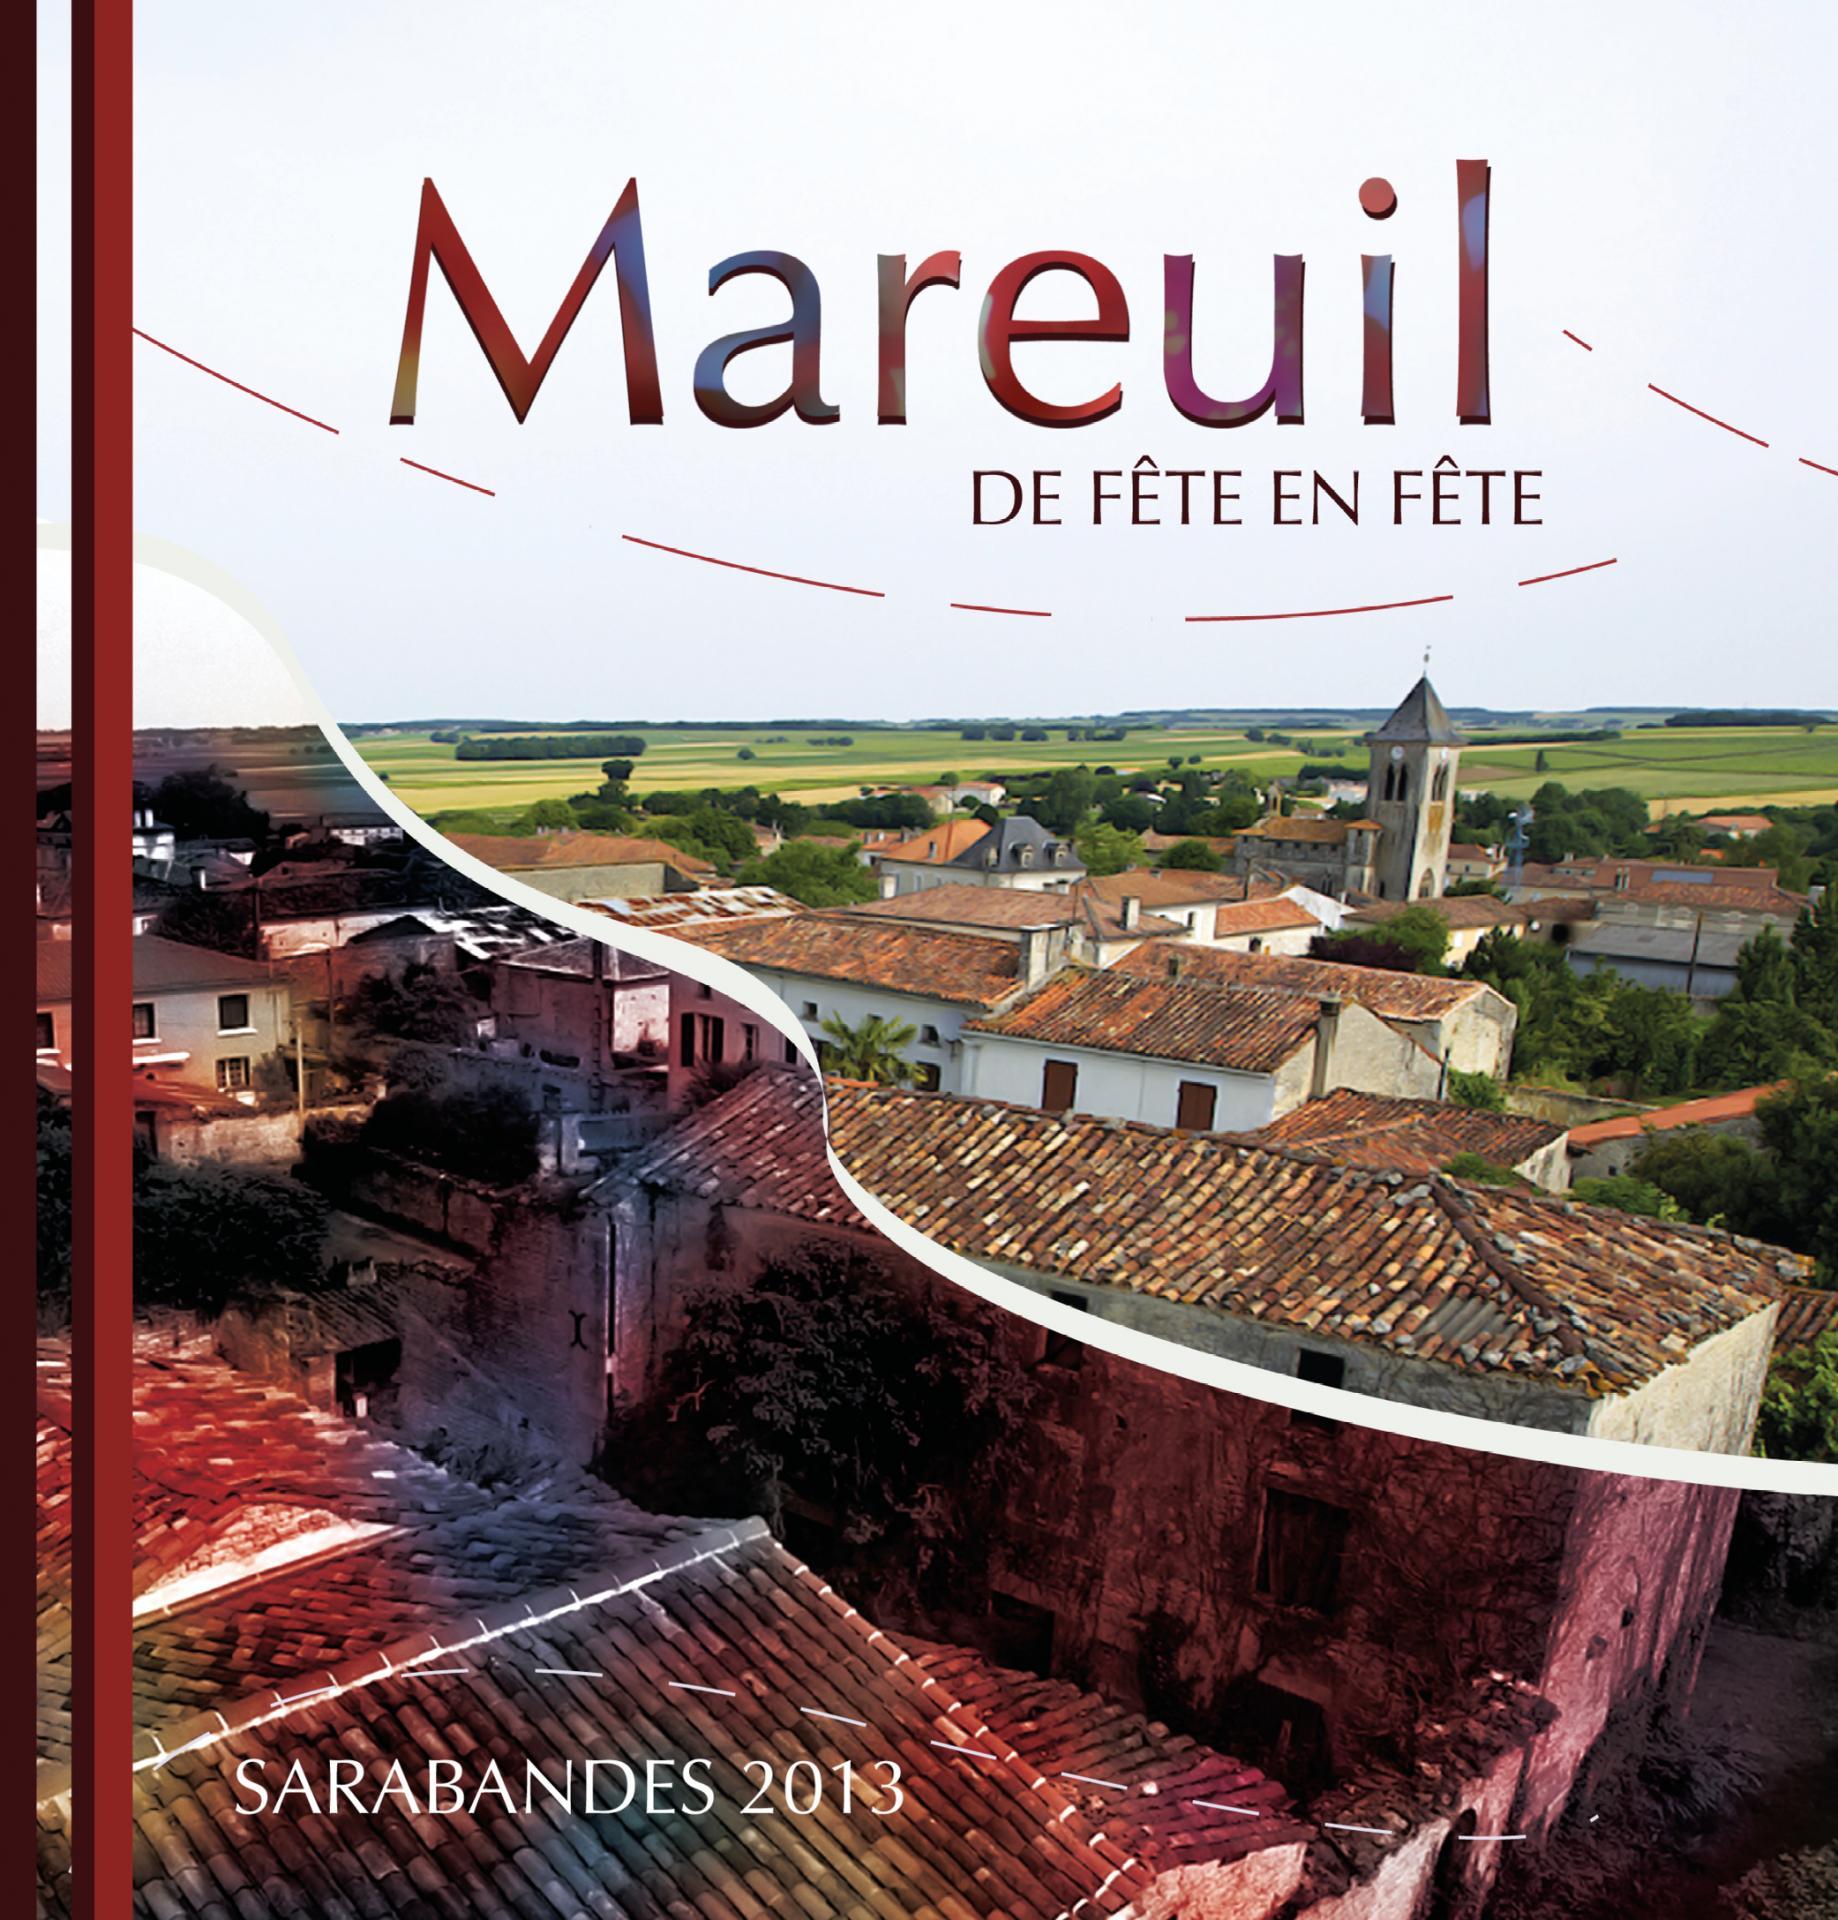 Sarabandes 2013 - Mareuil